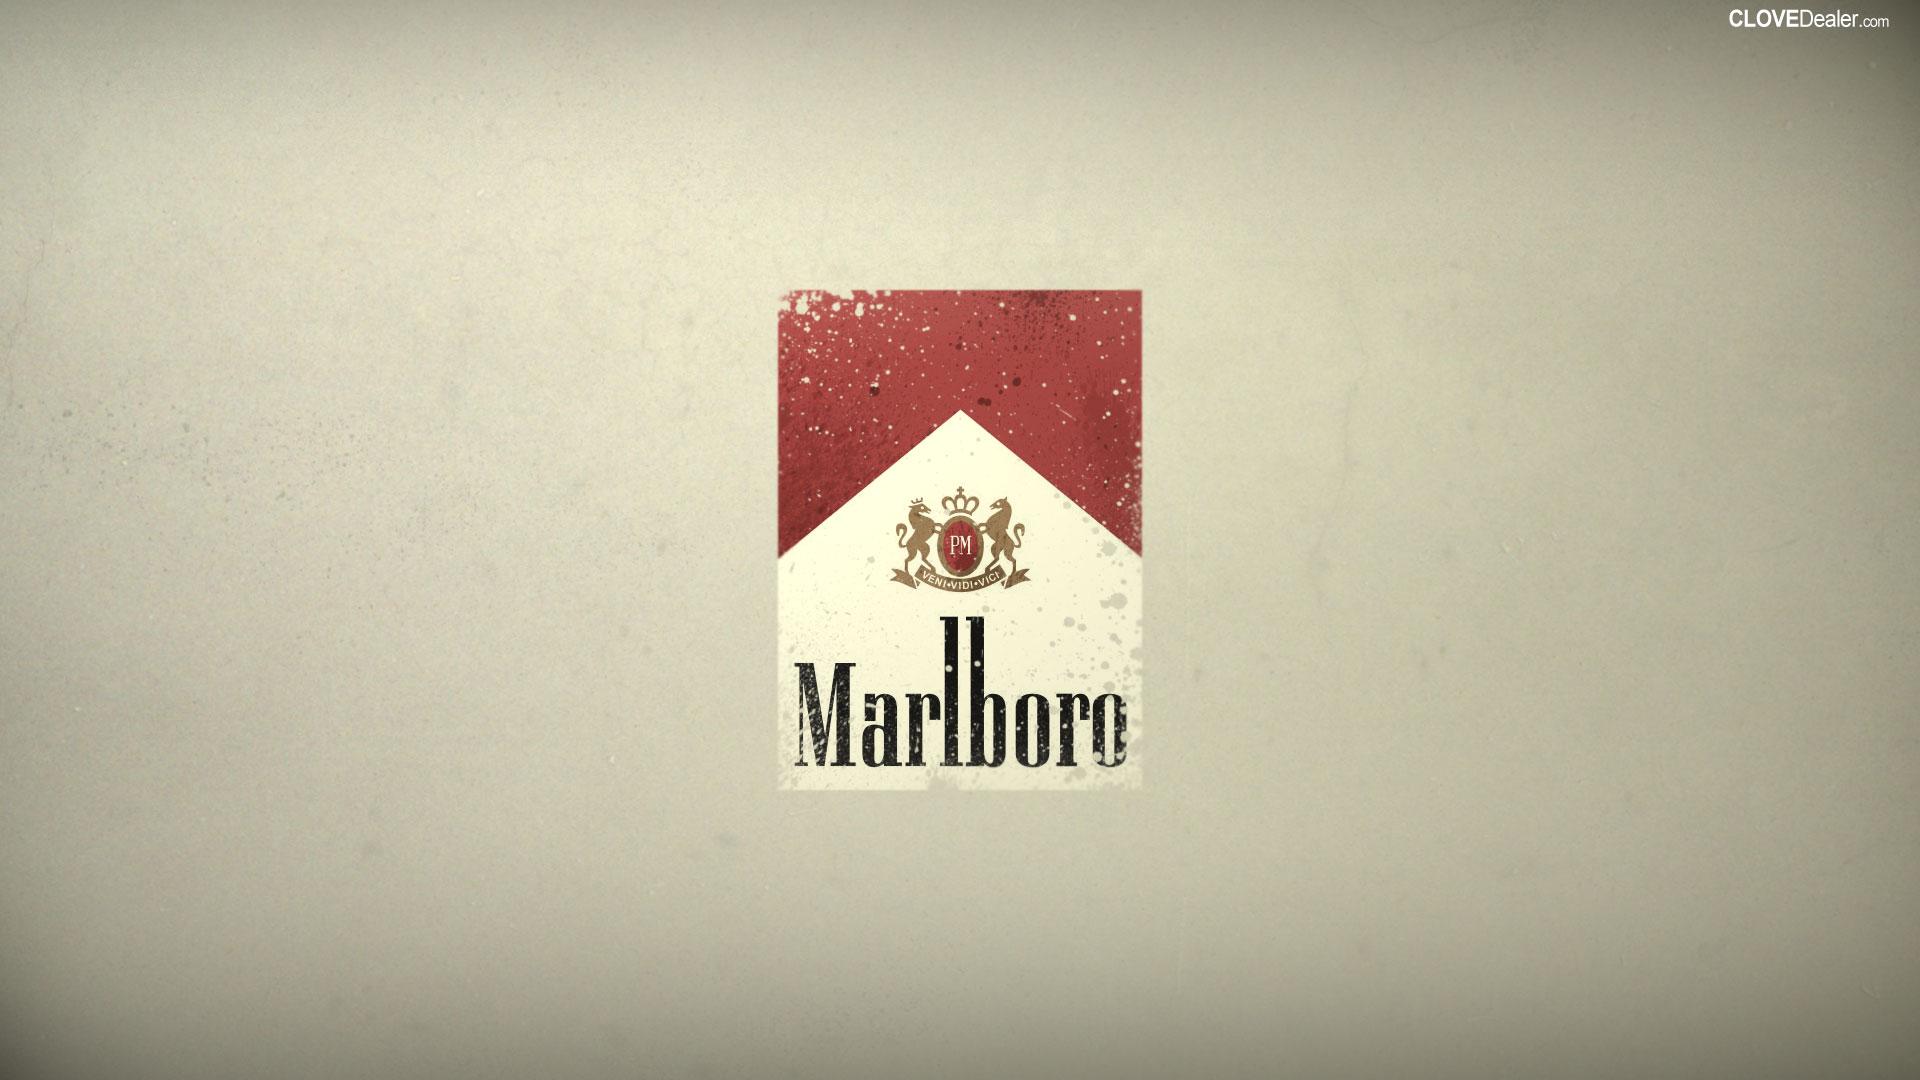 Wallpapers marlboro for desktop backgrounds marlboro 1920x1080